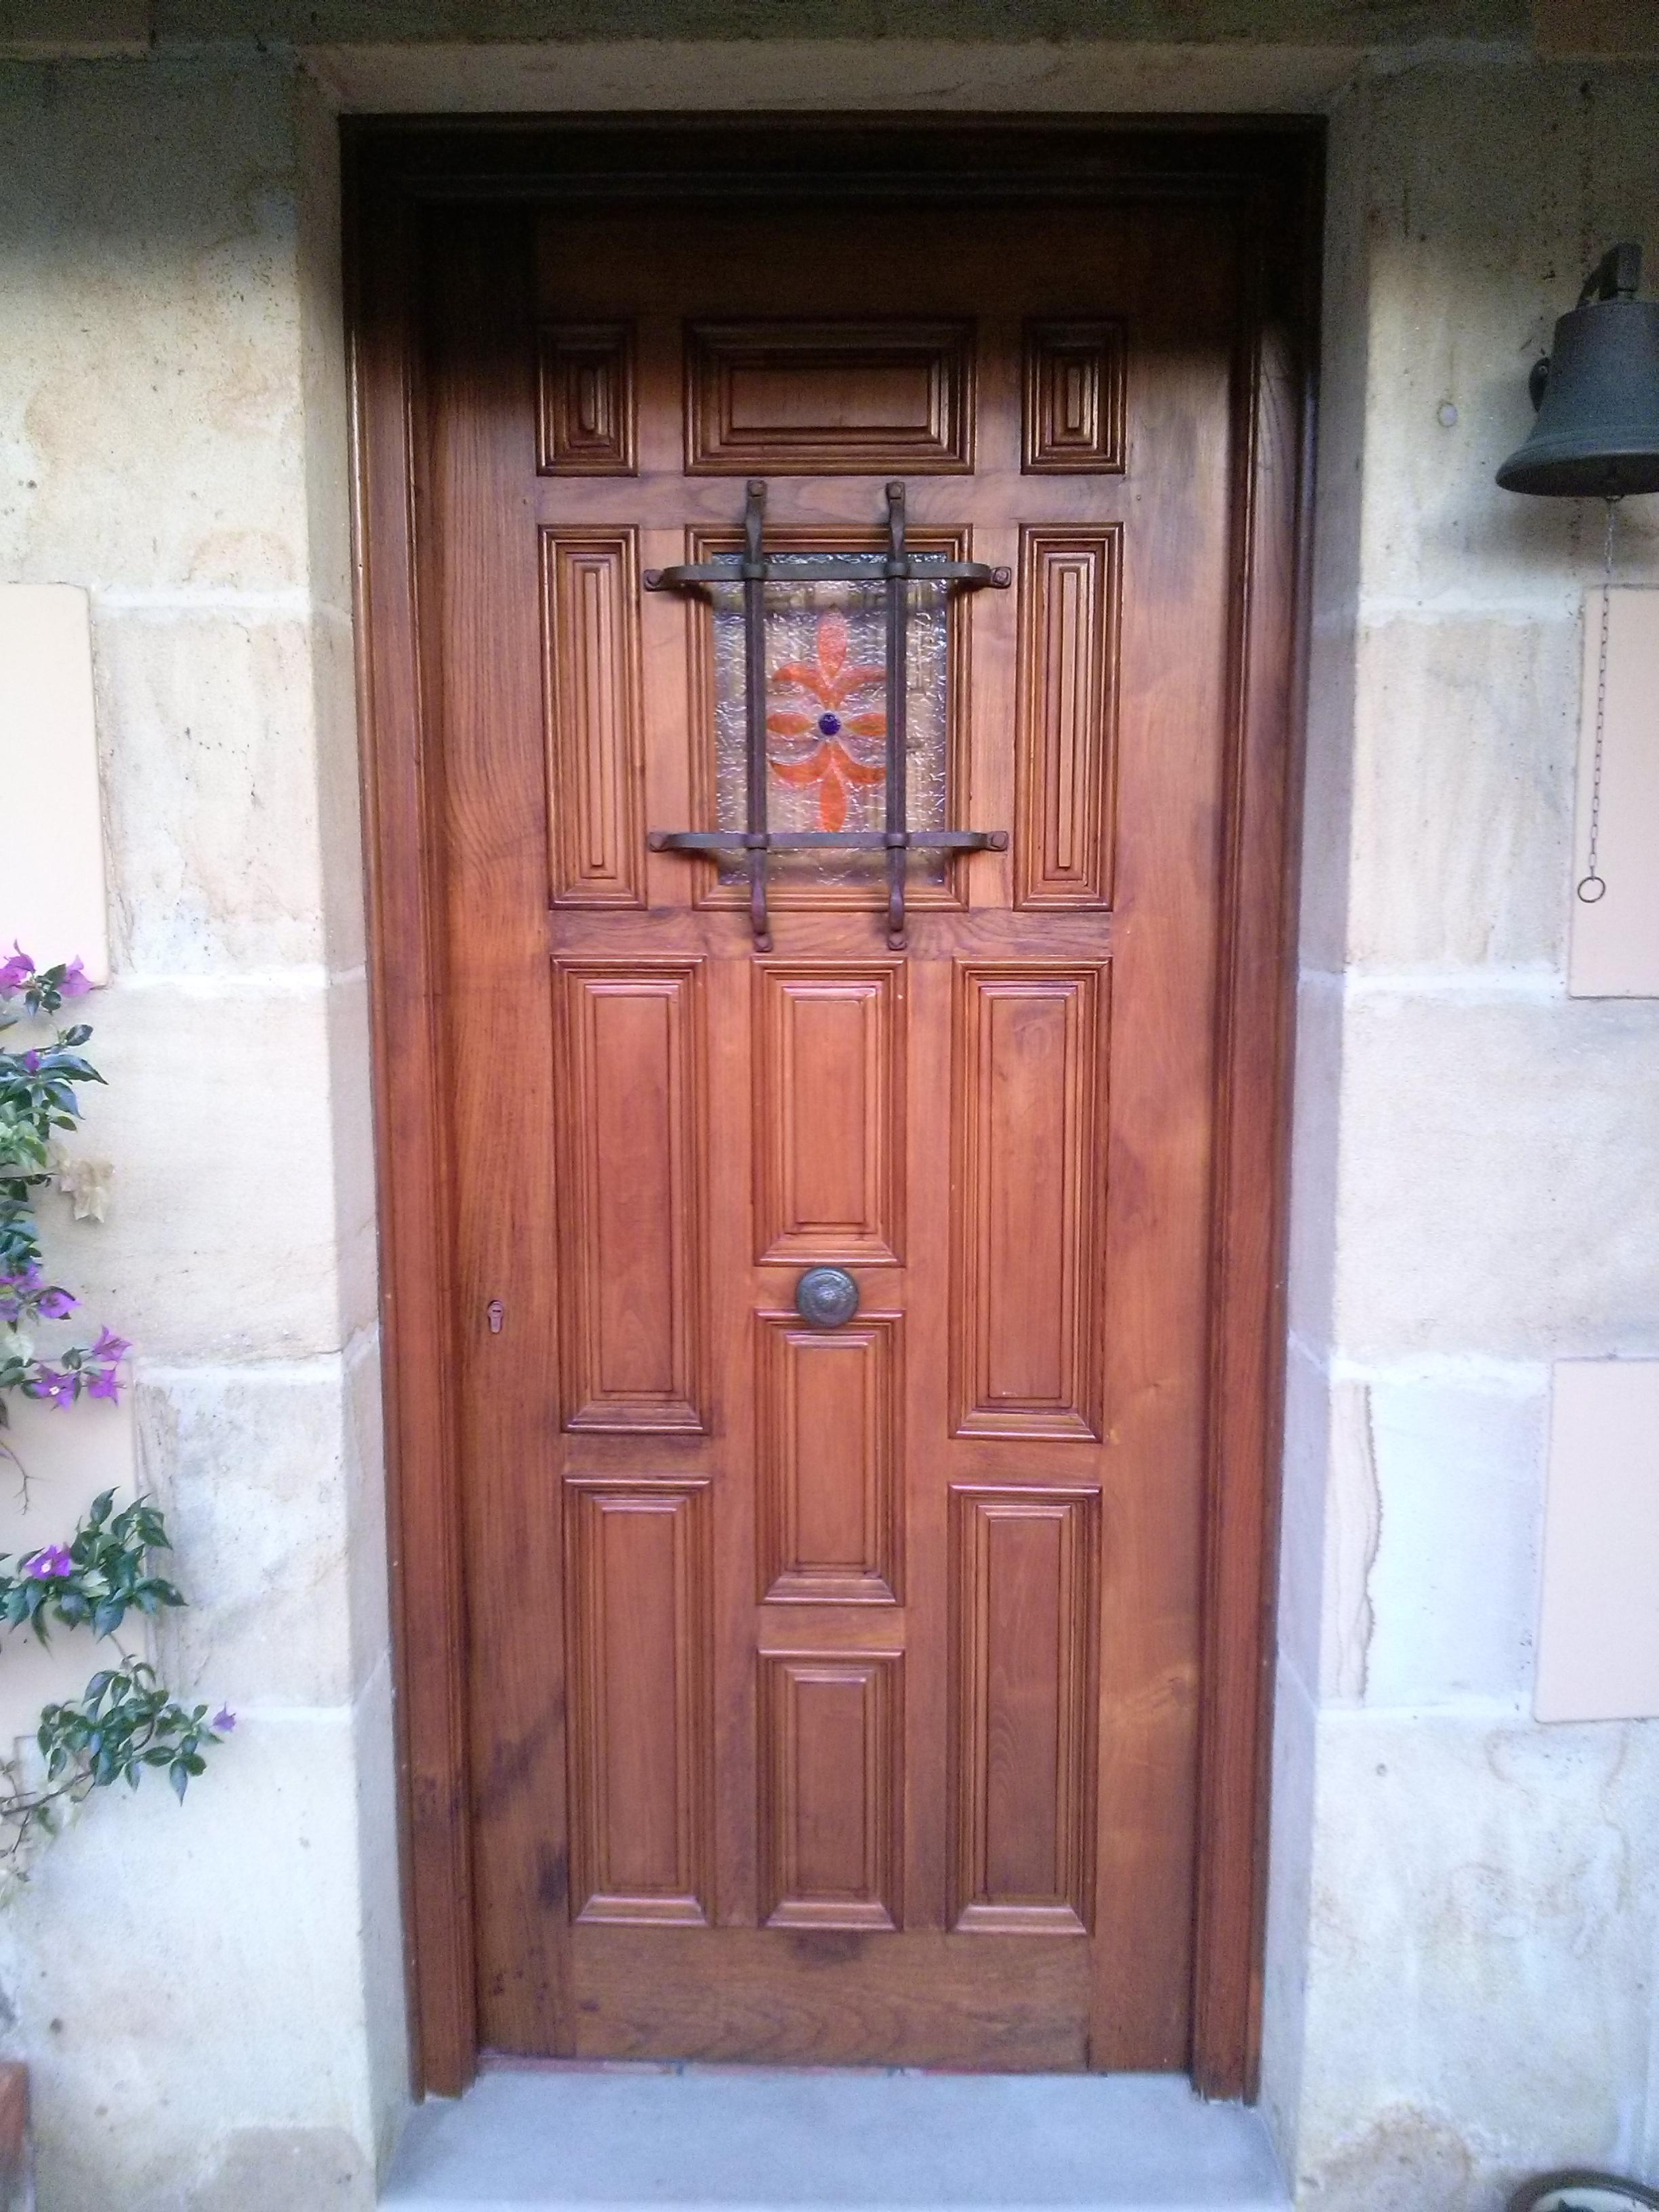 Carpinteria olcar fotos puertas cartes torrelavega - Puertas de reja ...